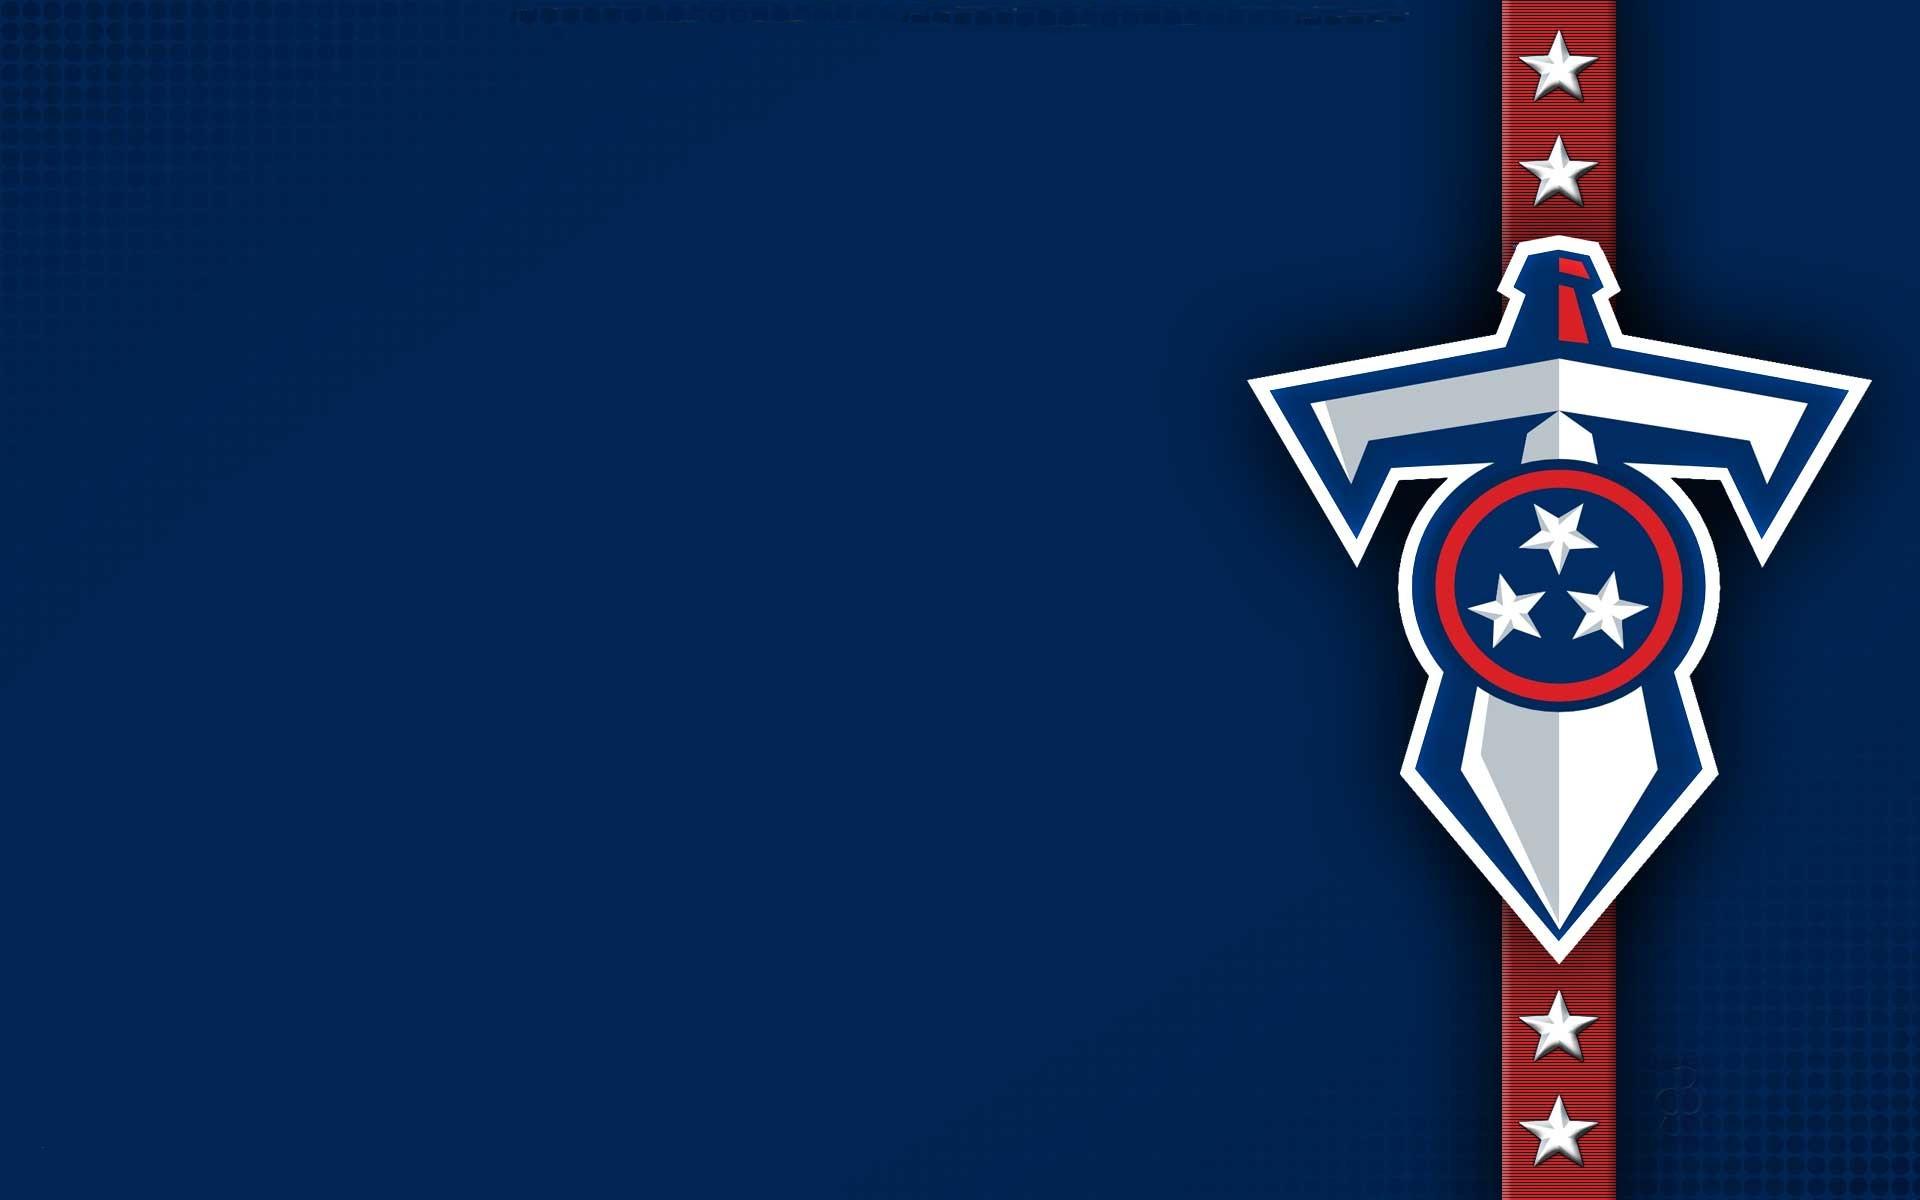 Tennessee Titans Wide Wallpaper1920x1200